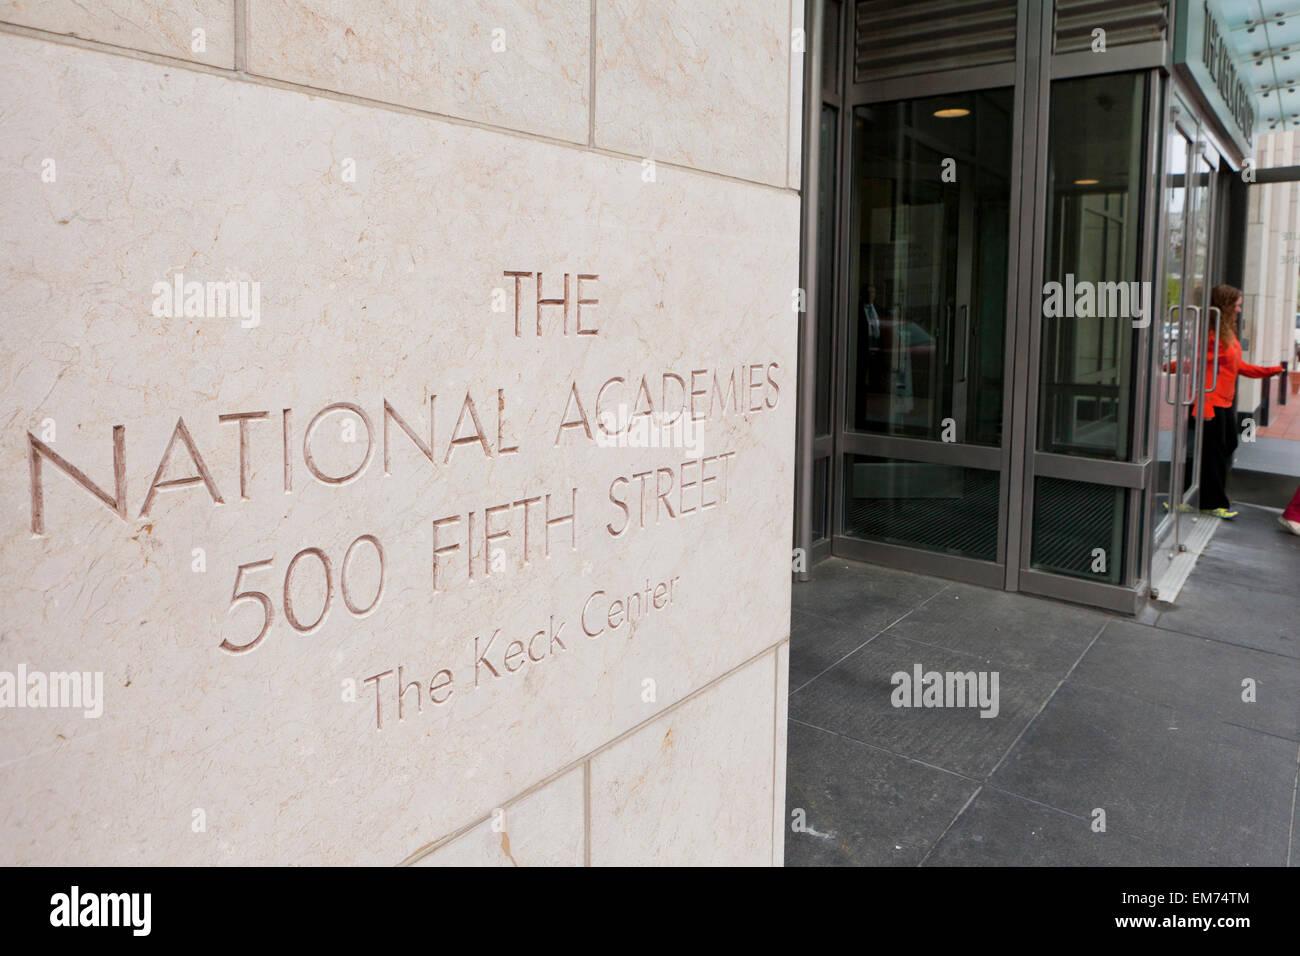 National Academy of Sciences, The Keck Center - Washington, DC USA - Stock Image